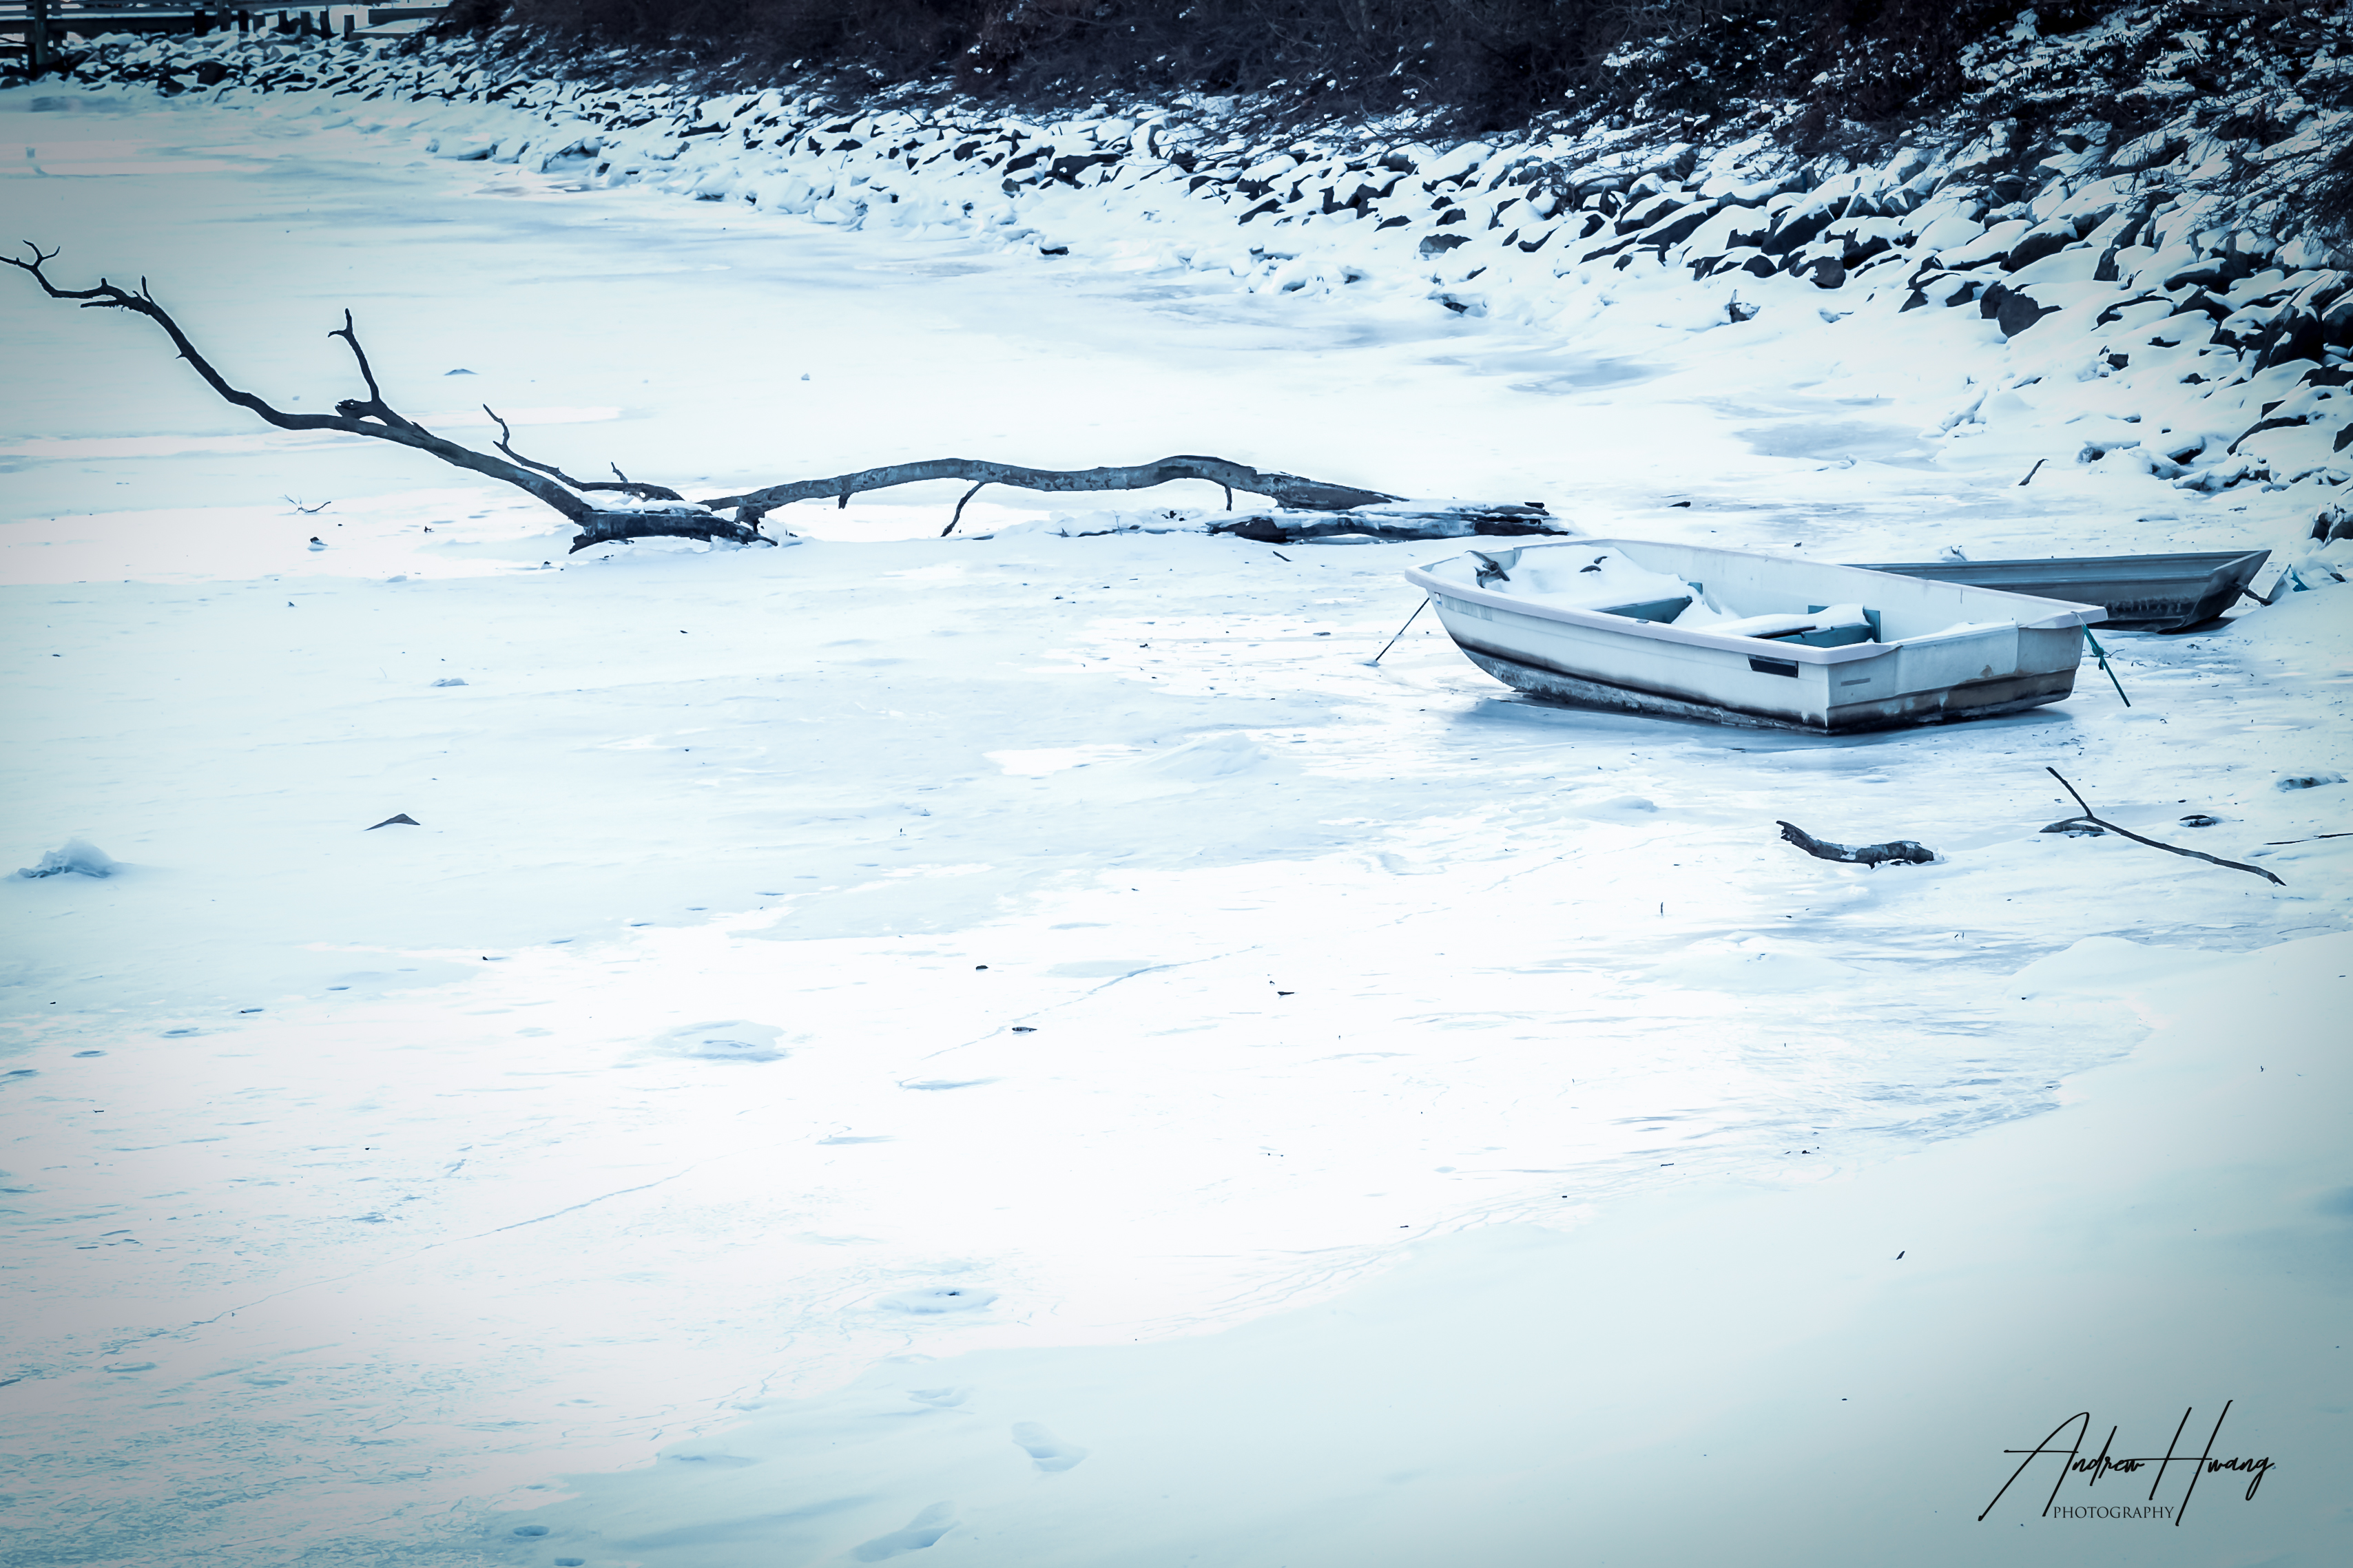 Frozen Stuck in the Galesville Harbor Yacht Club